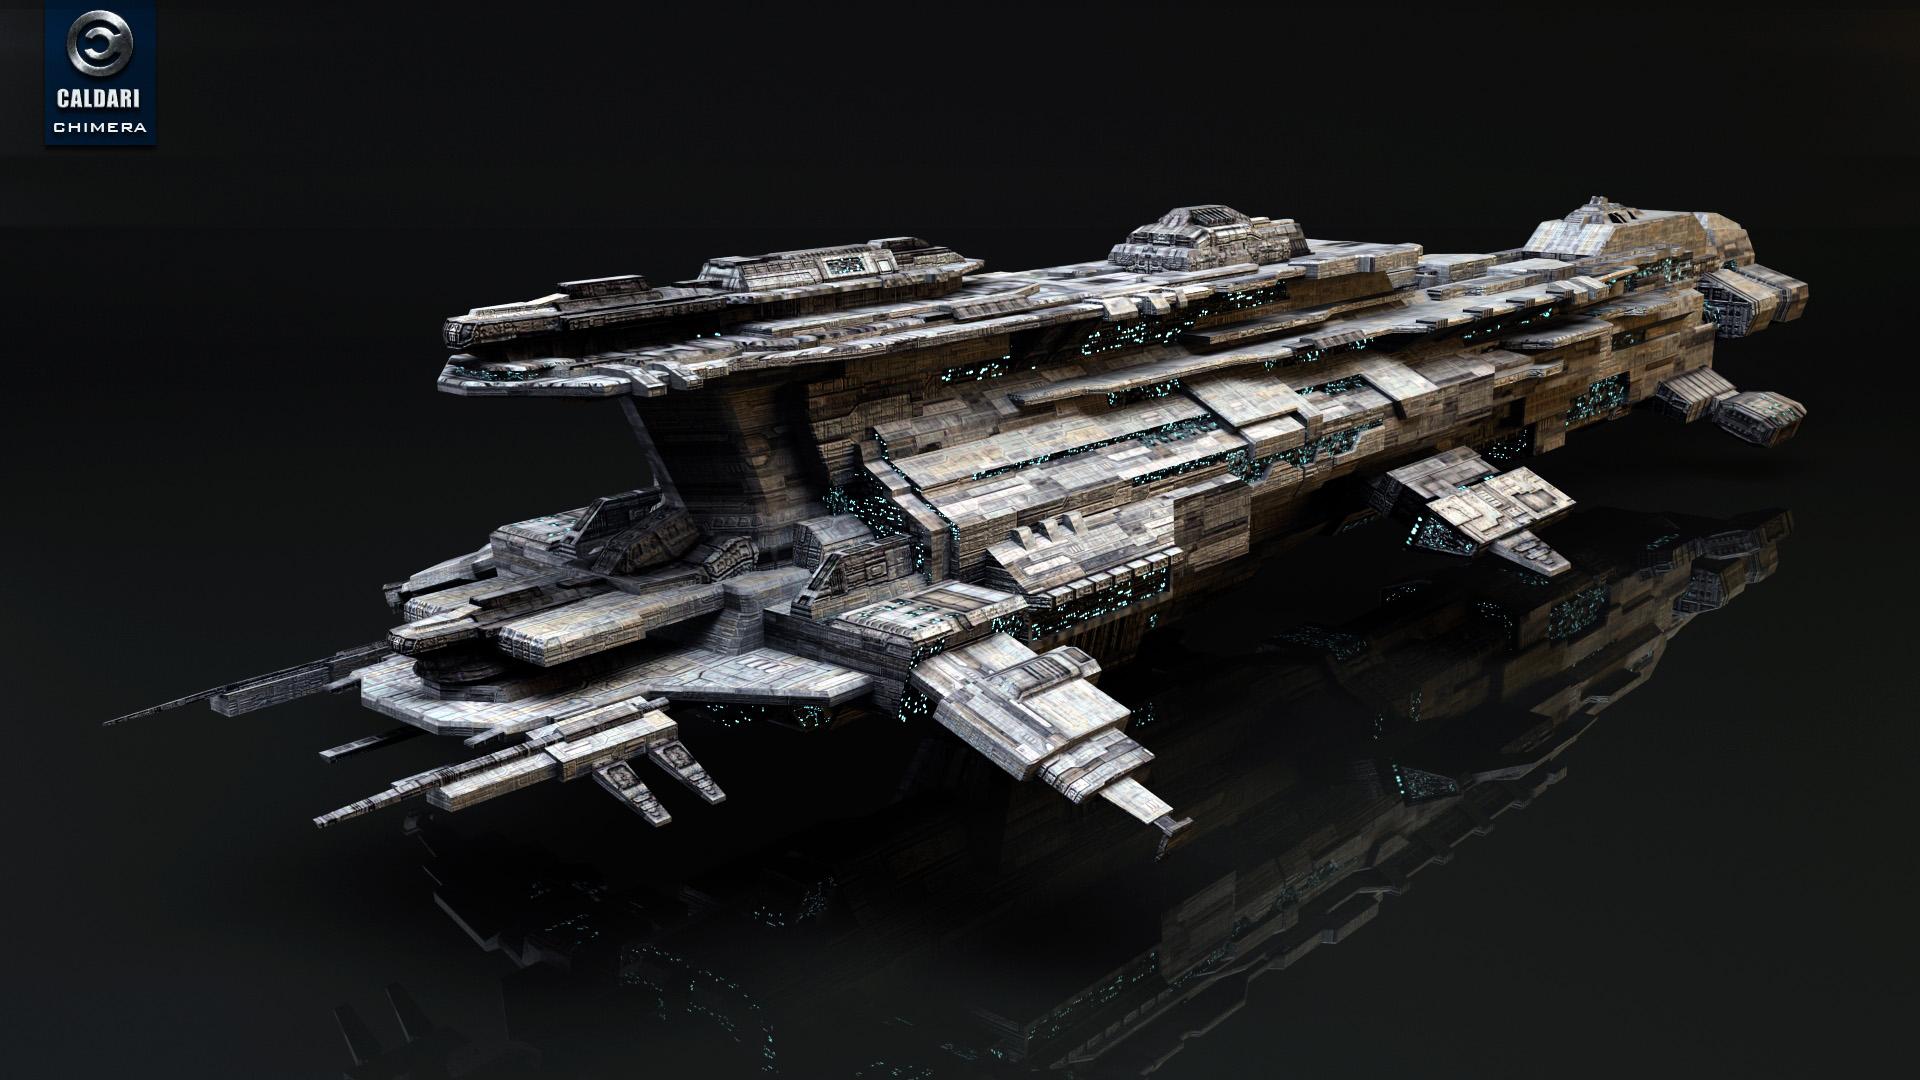 EVE ONLINE sci-fi game spaceship t wallpaper | 1920x1080 ...